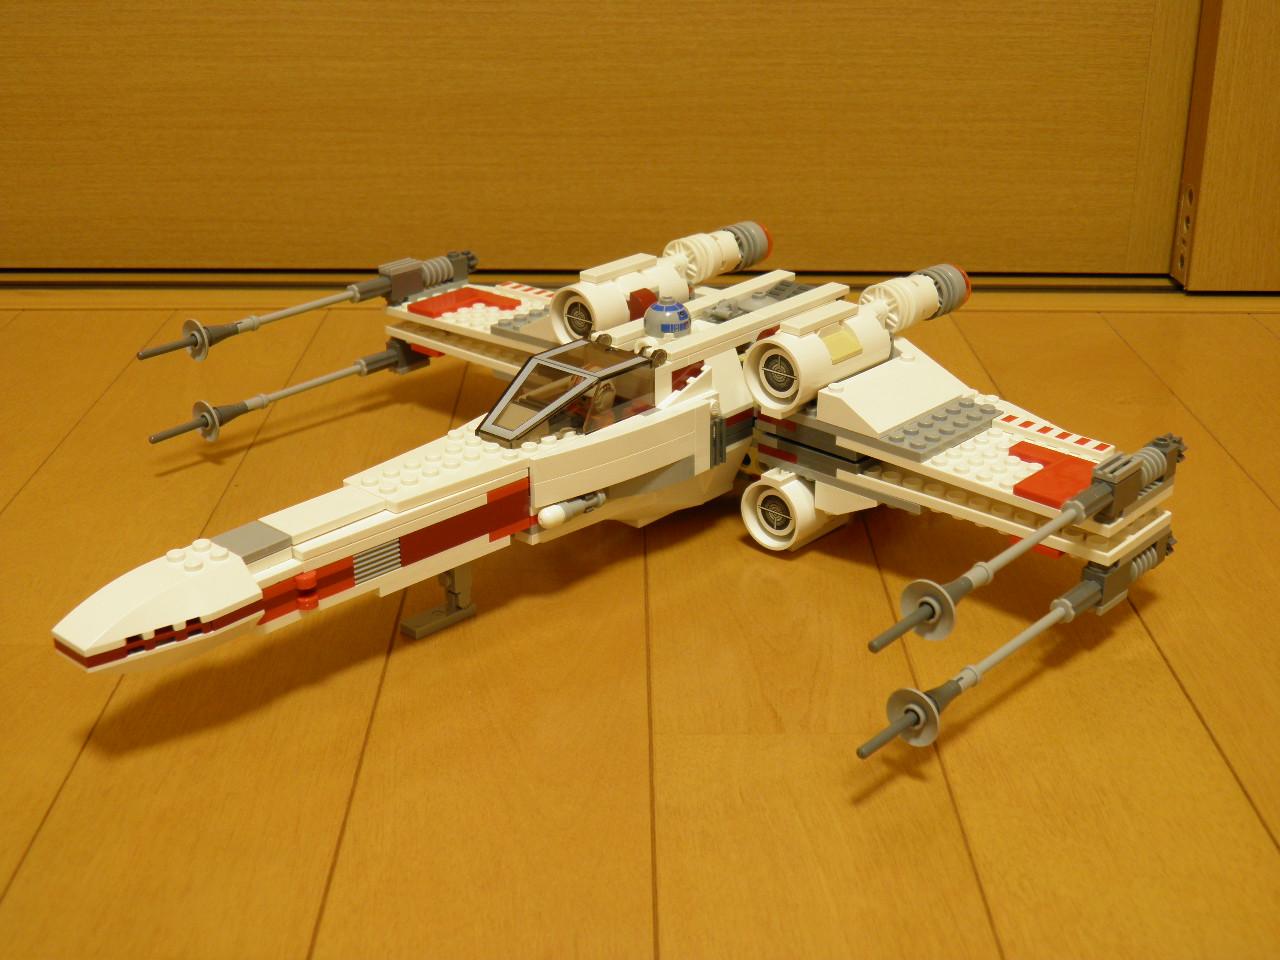 LEGO Xwing 001